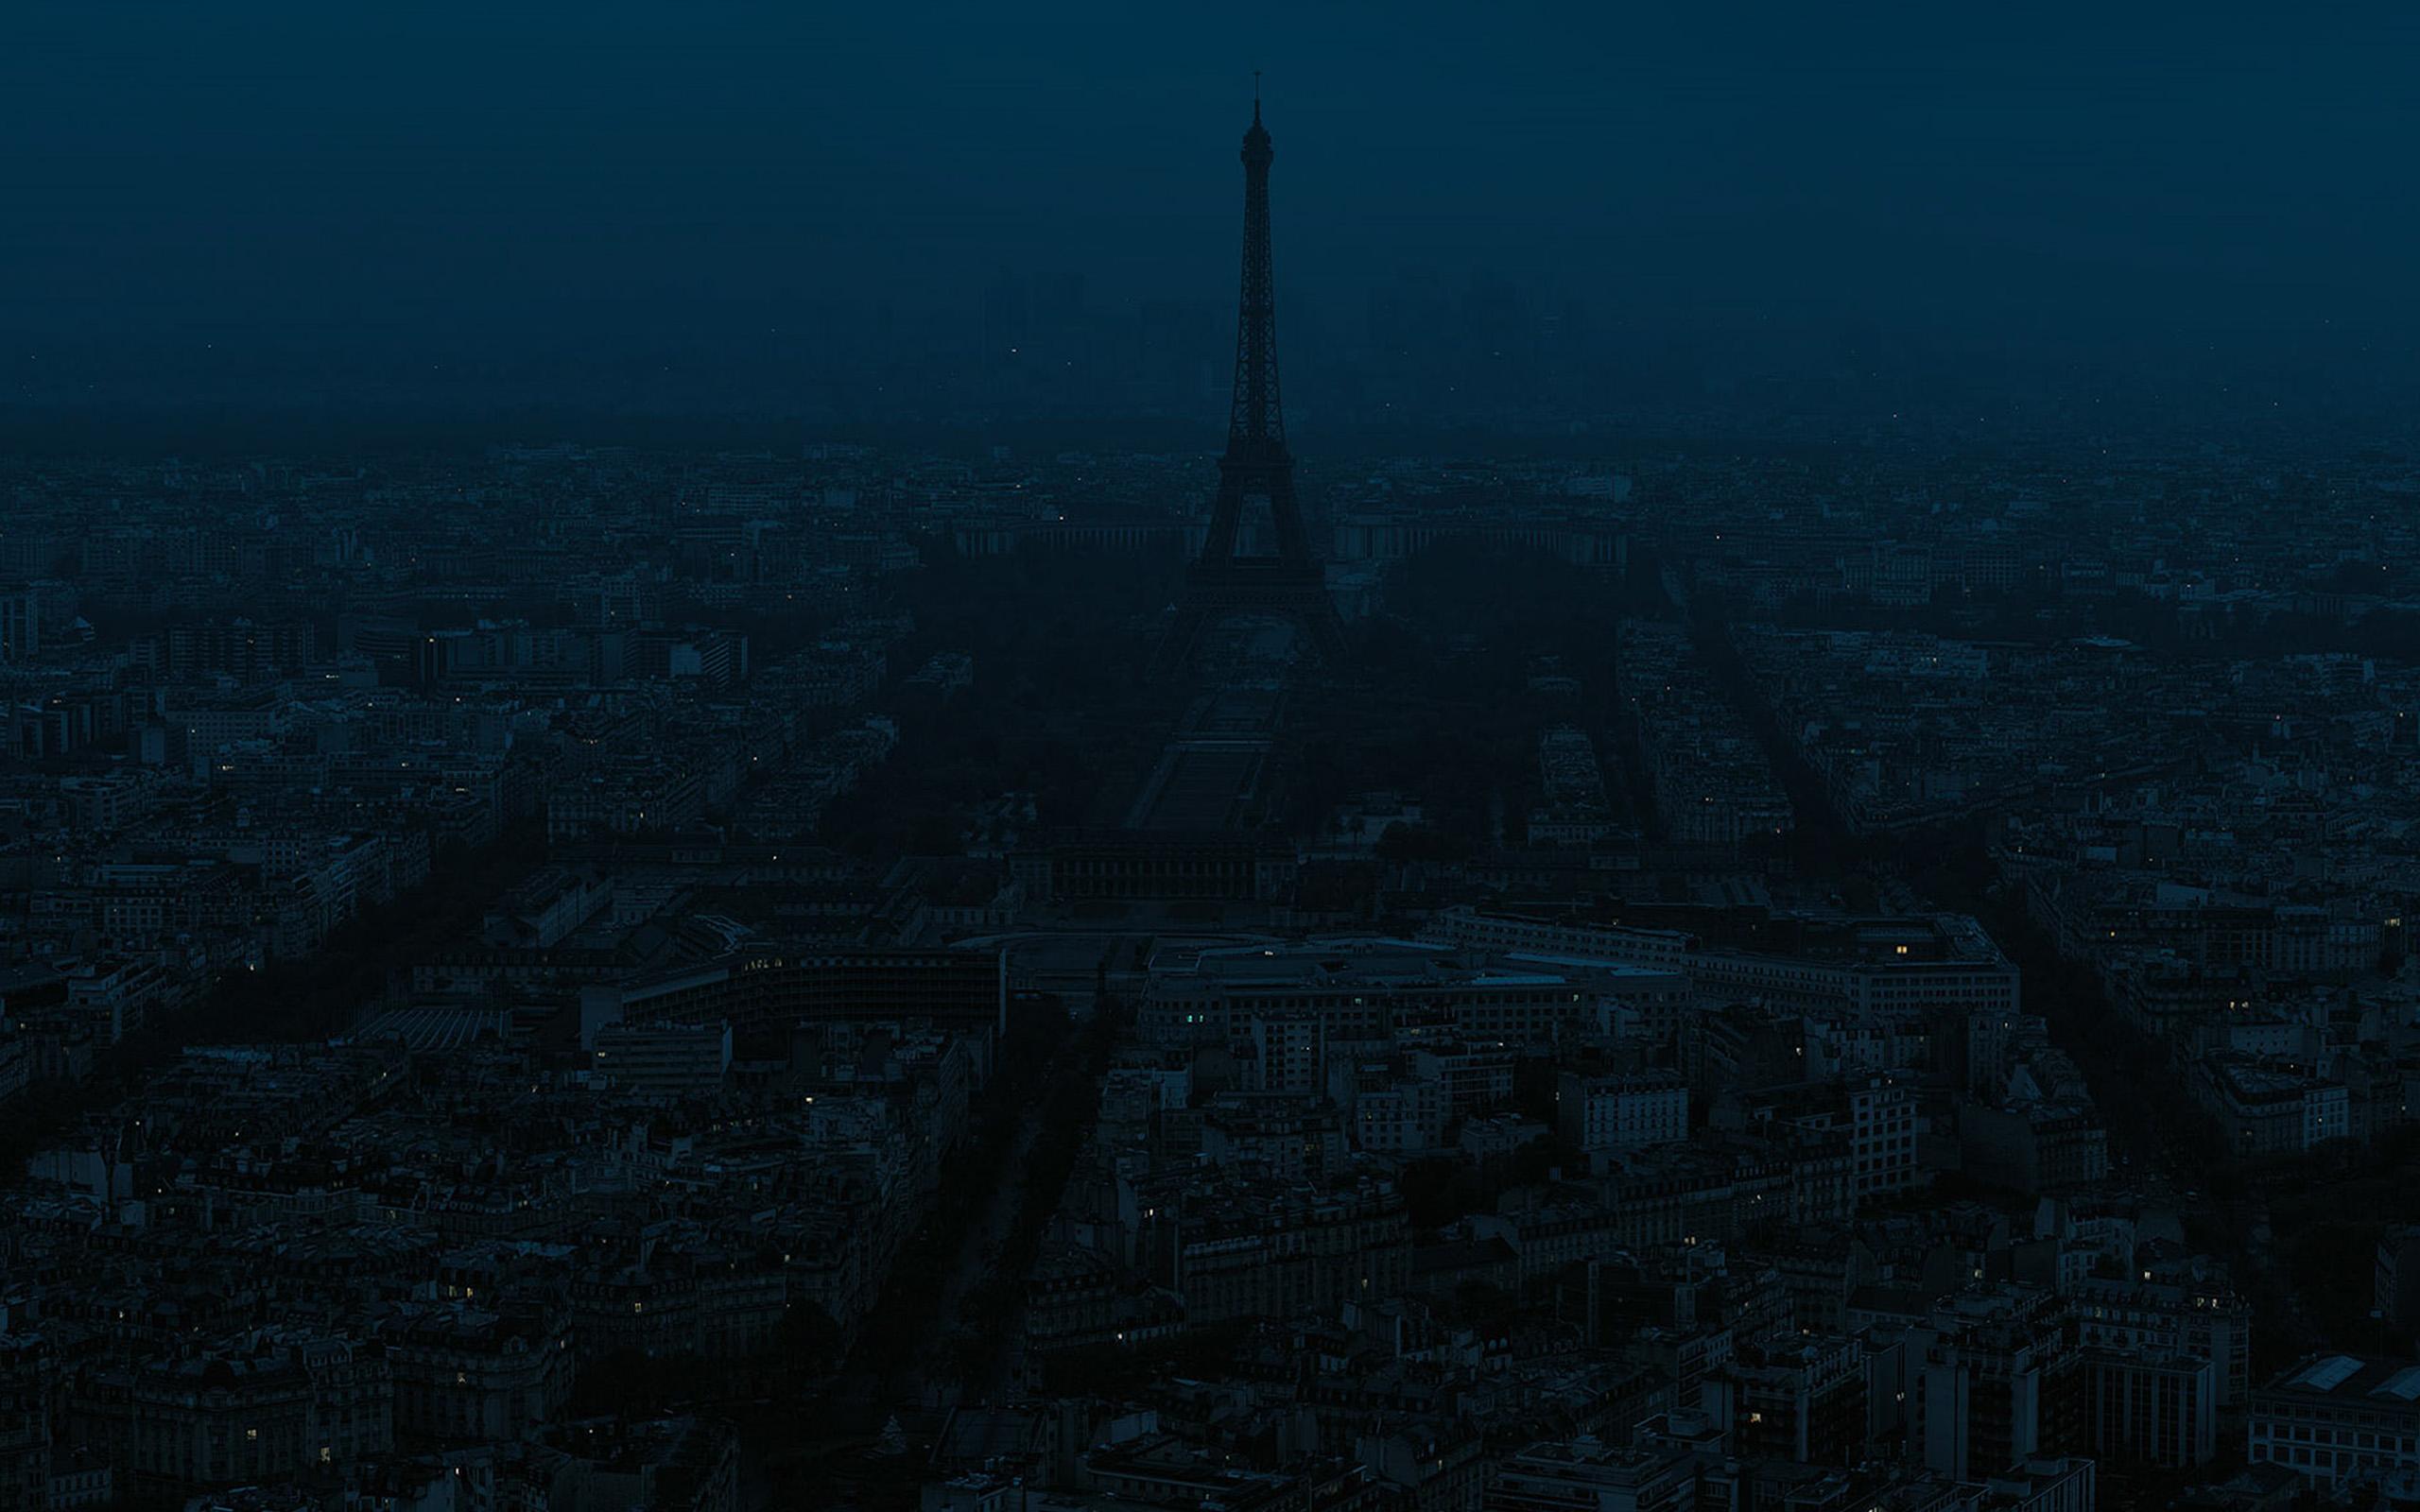 Amazing Wallpaper Macbook Paris - papers  Graphic_407437.jpg